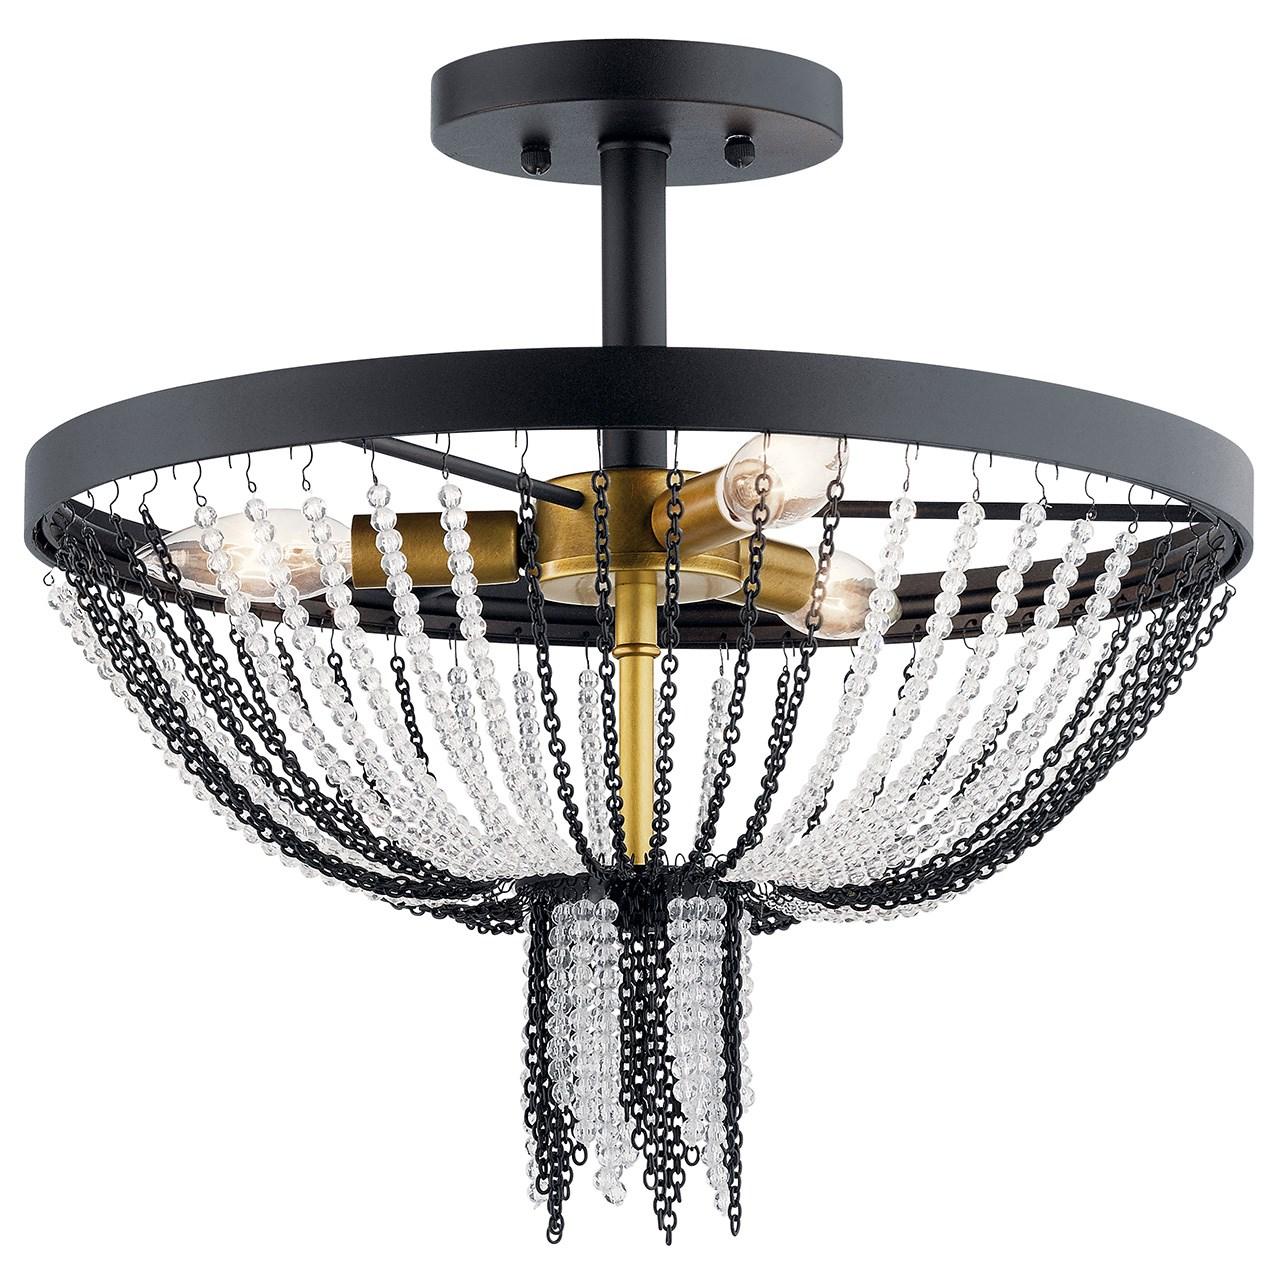 Alexia 16 3 Light Semi Flush With Crystal Beads Textured Black Kichler Lighting